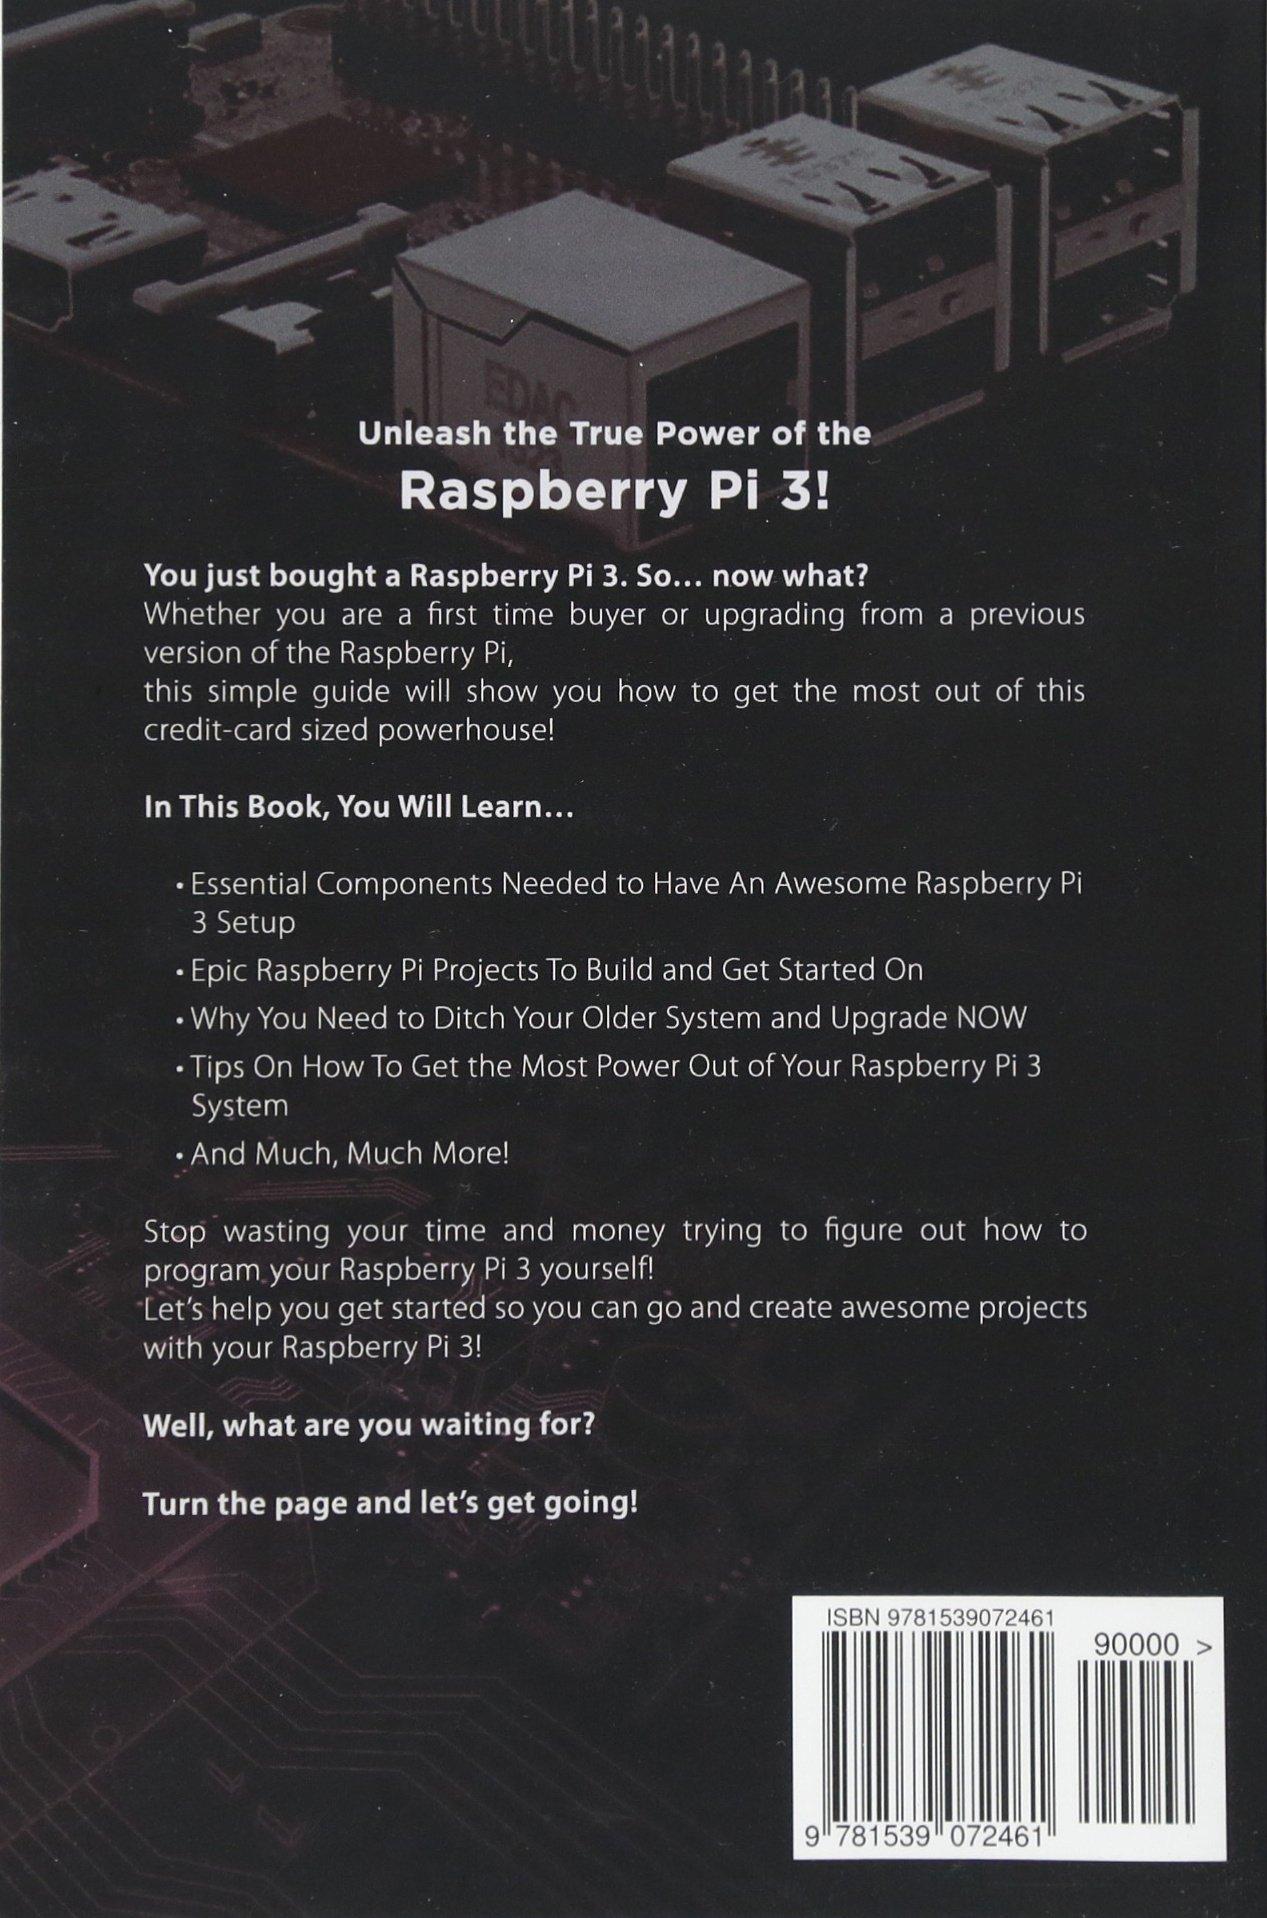 Amazon com: Raspberry Pi 3: A Simple Guide to Help You Get